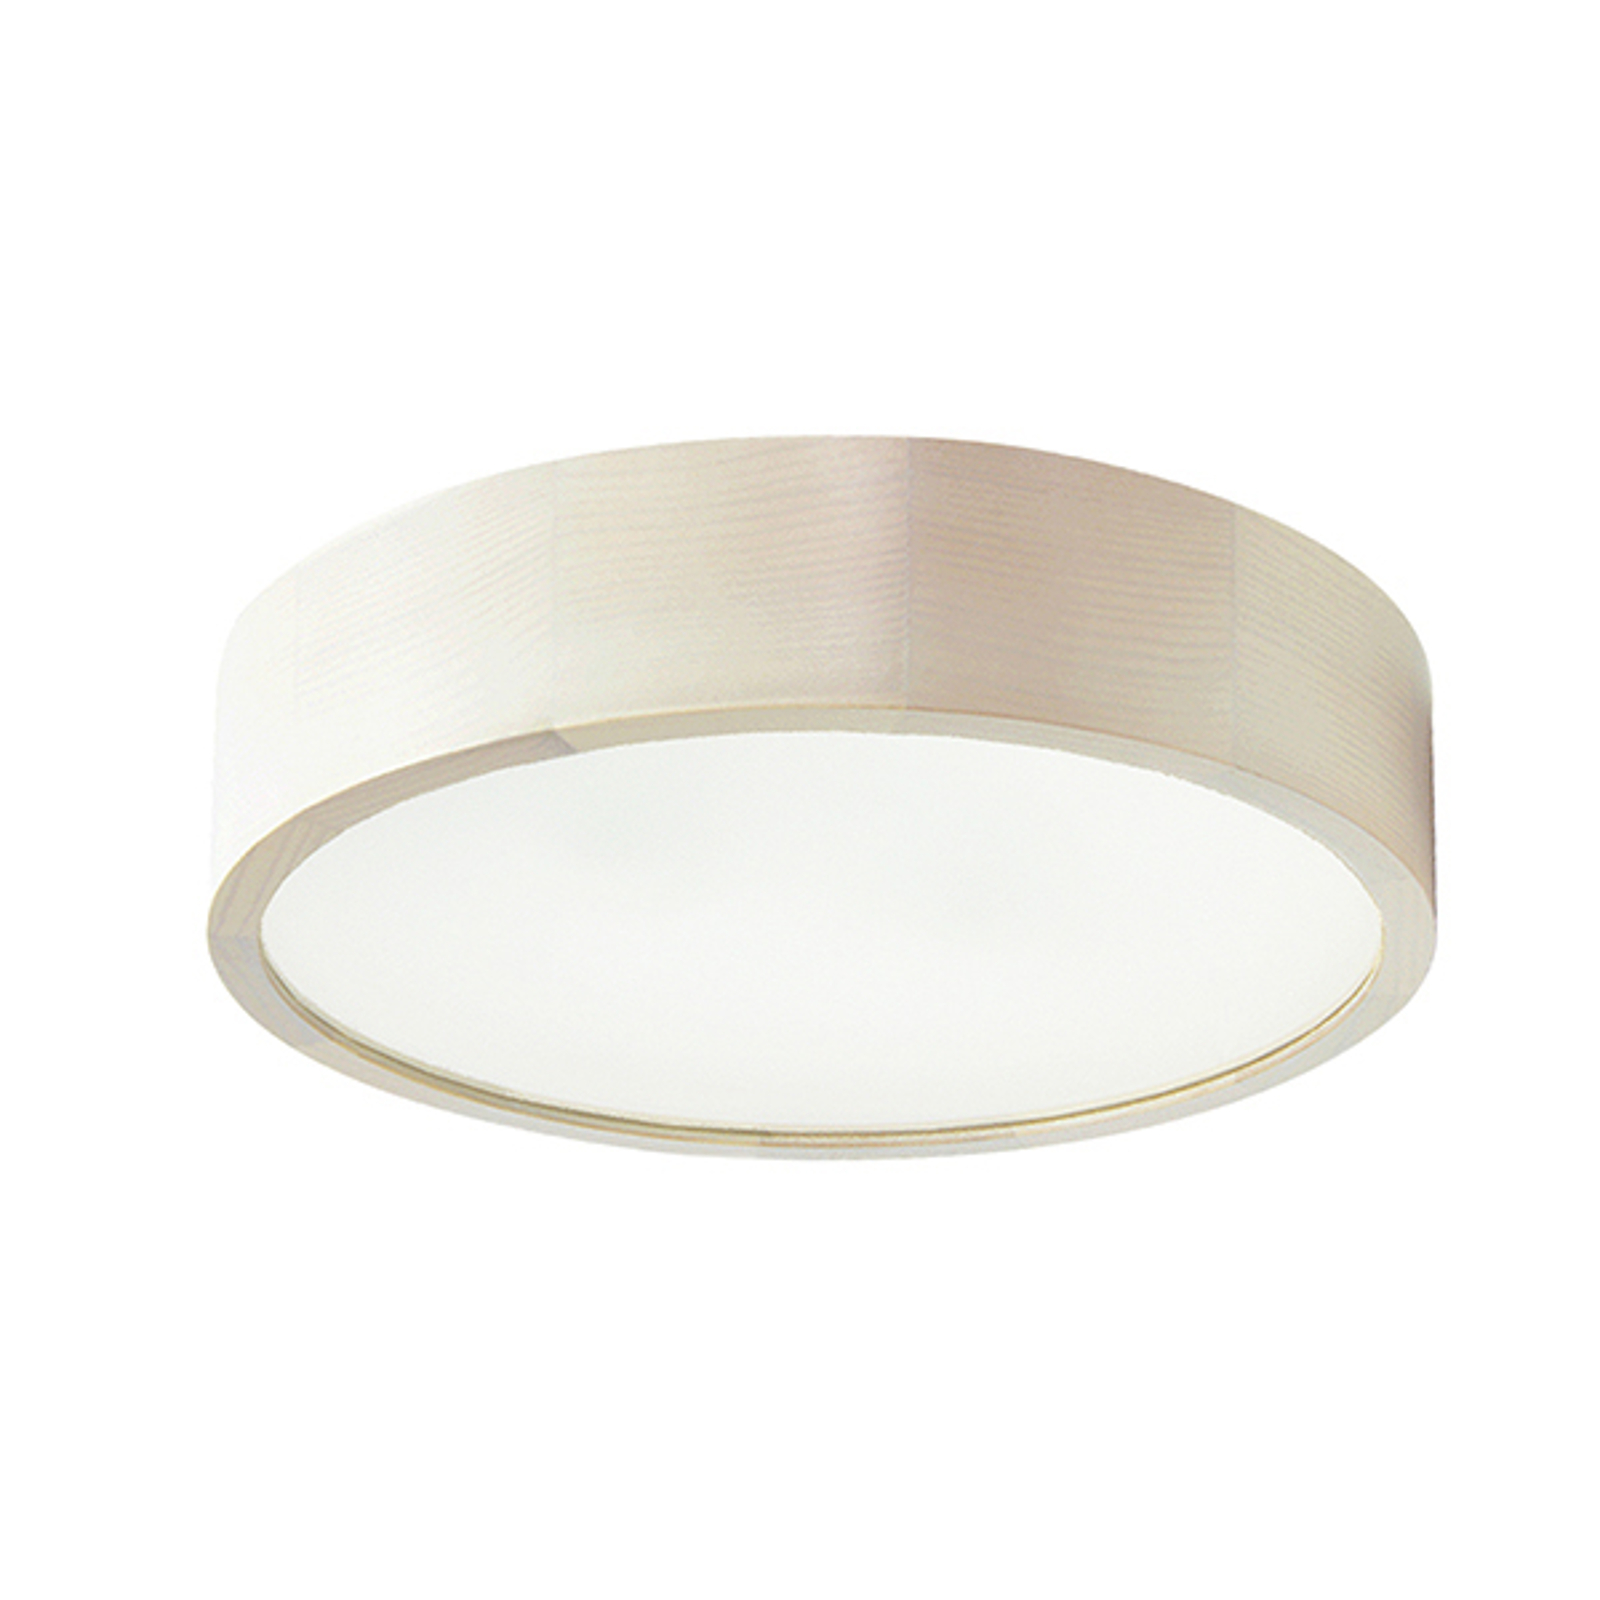 LED-taklampe Cleo, Ø 38 cm, hvit